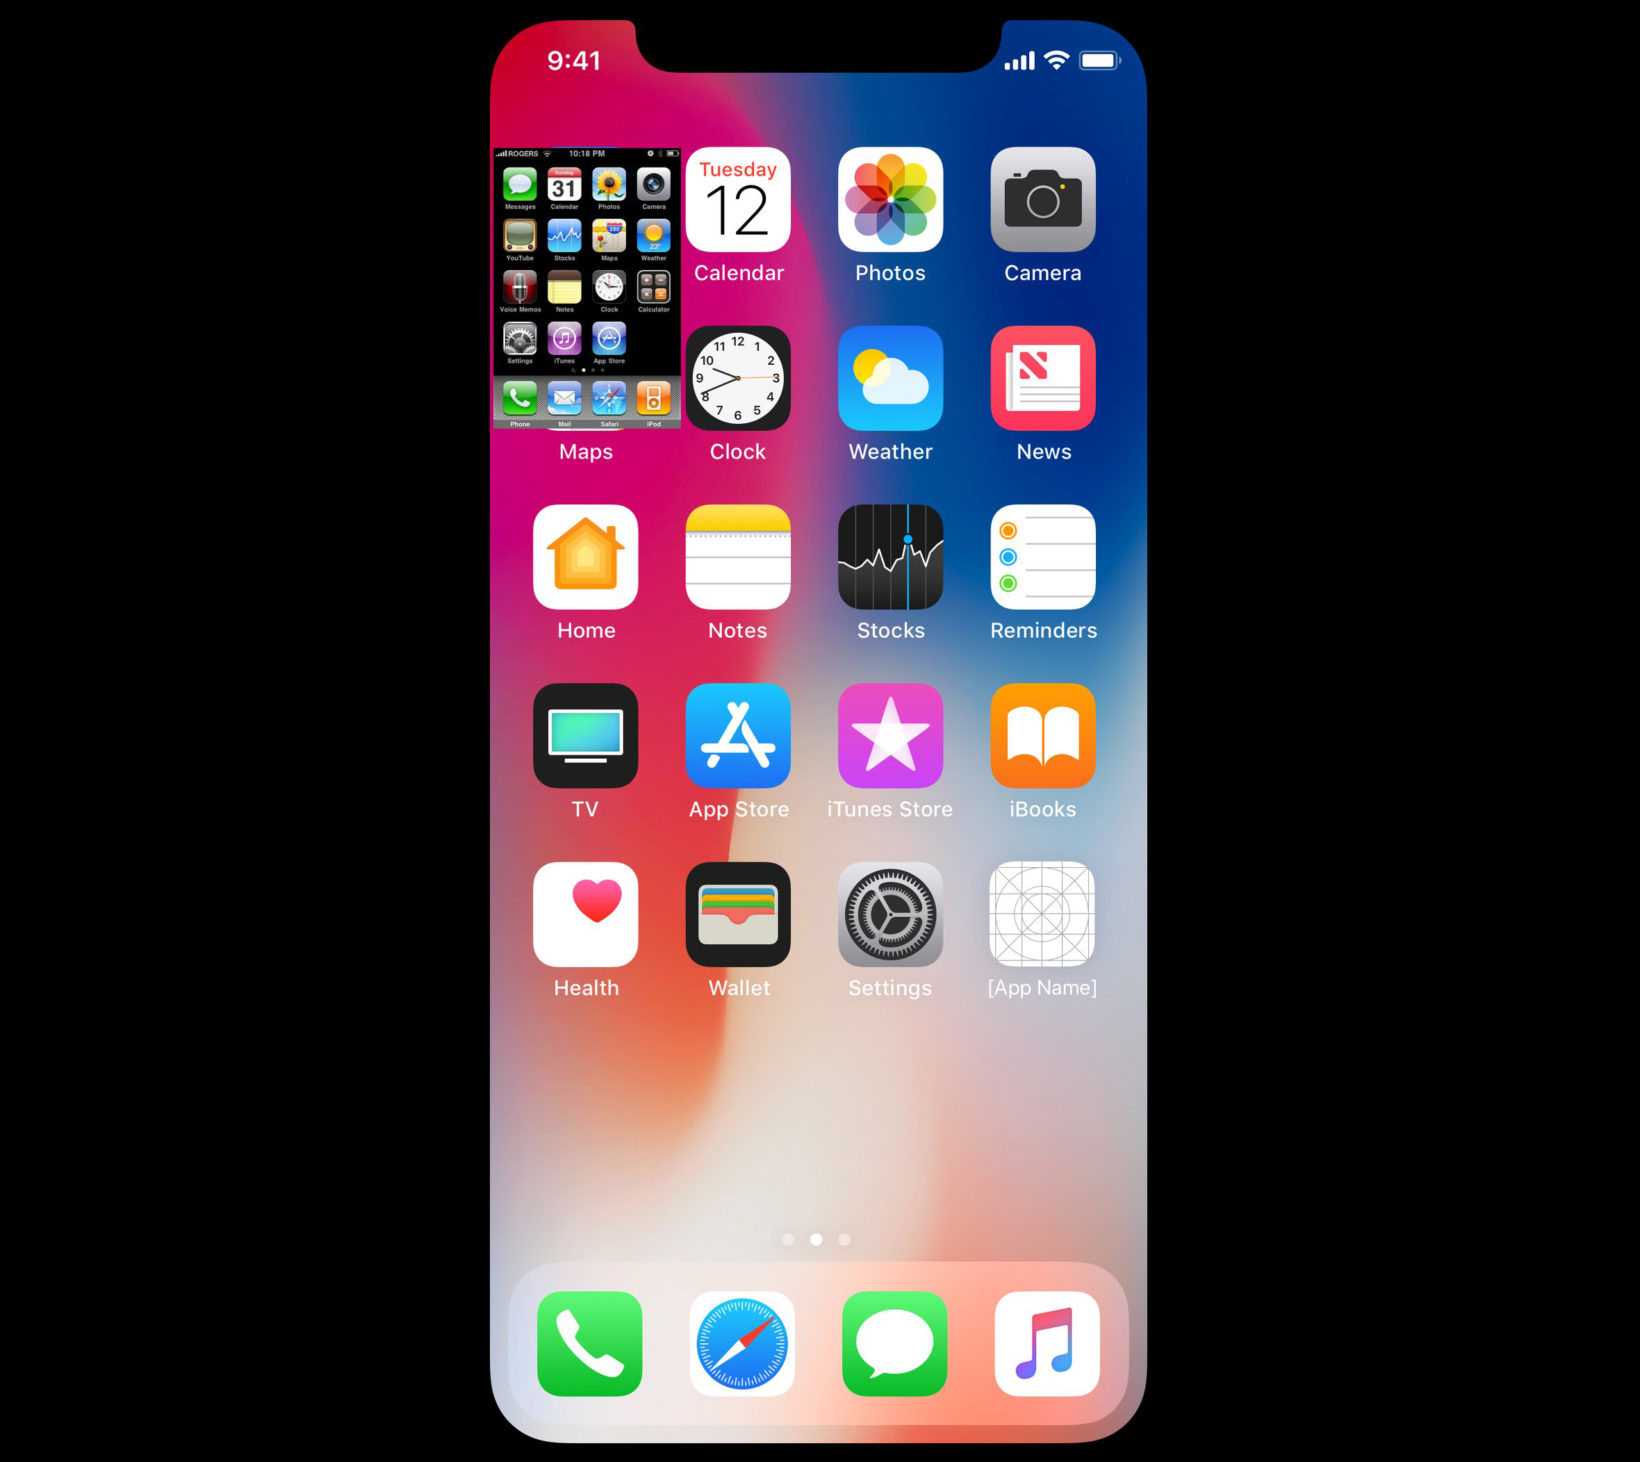 iPhone X iPhone 2G confronto schermo